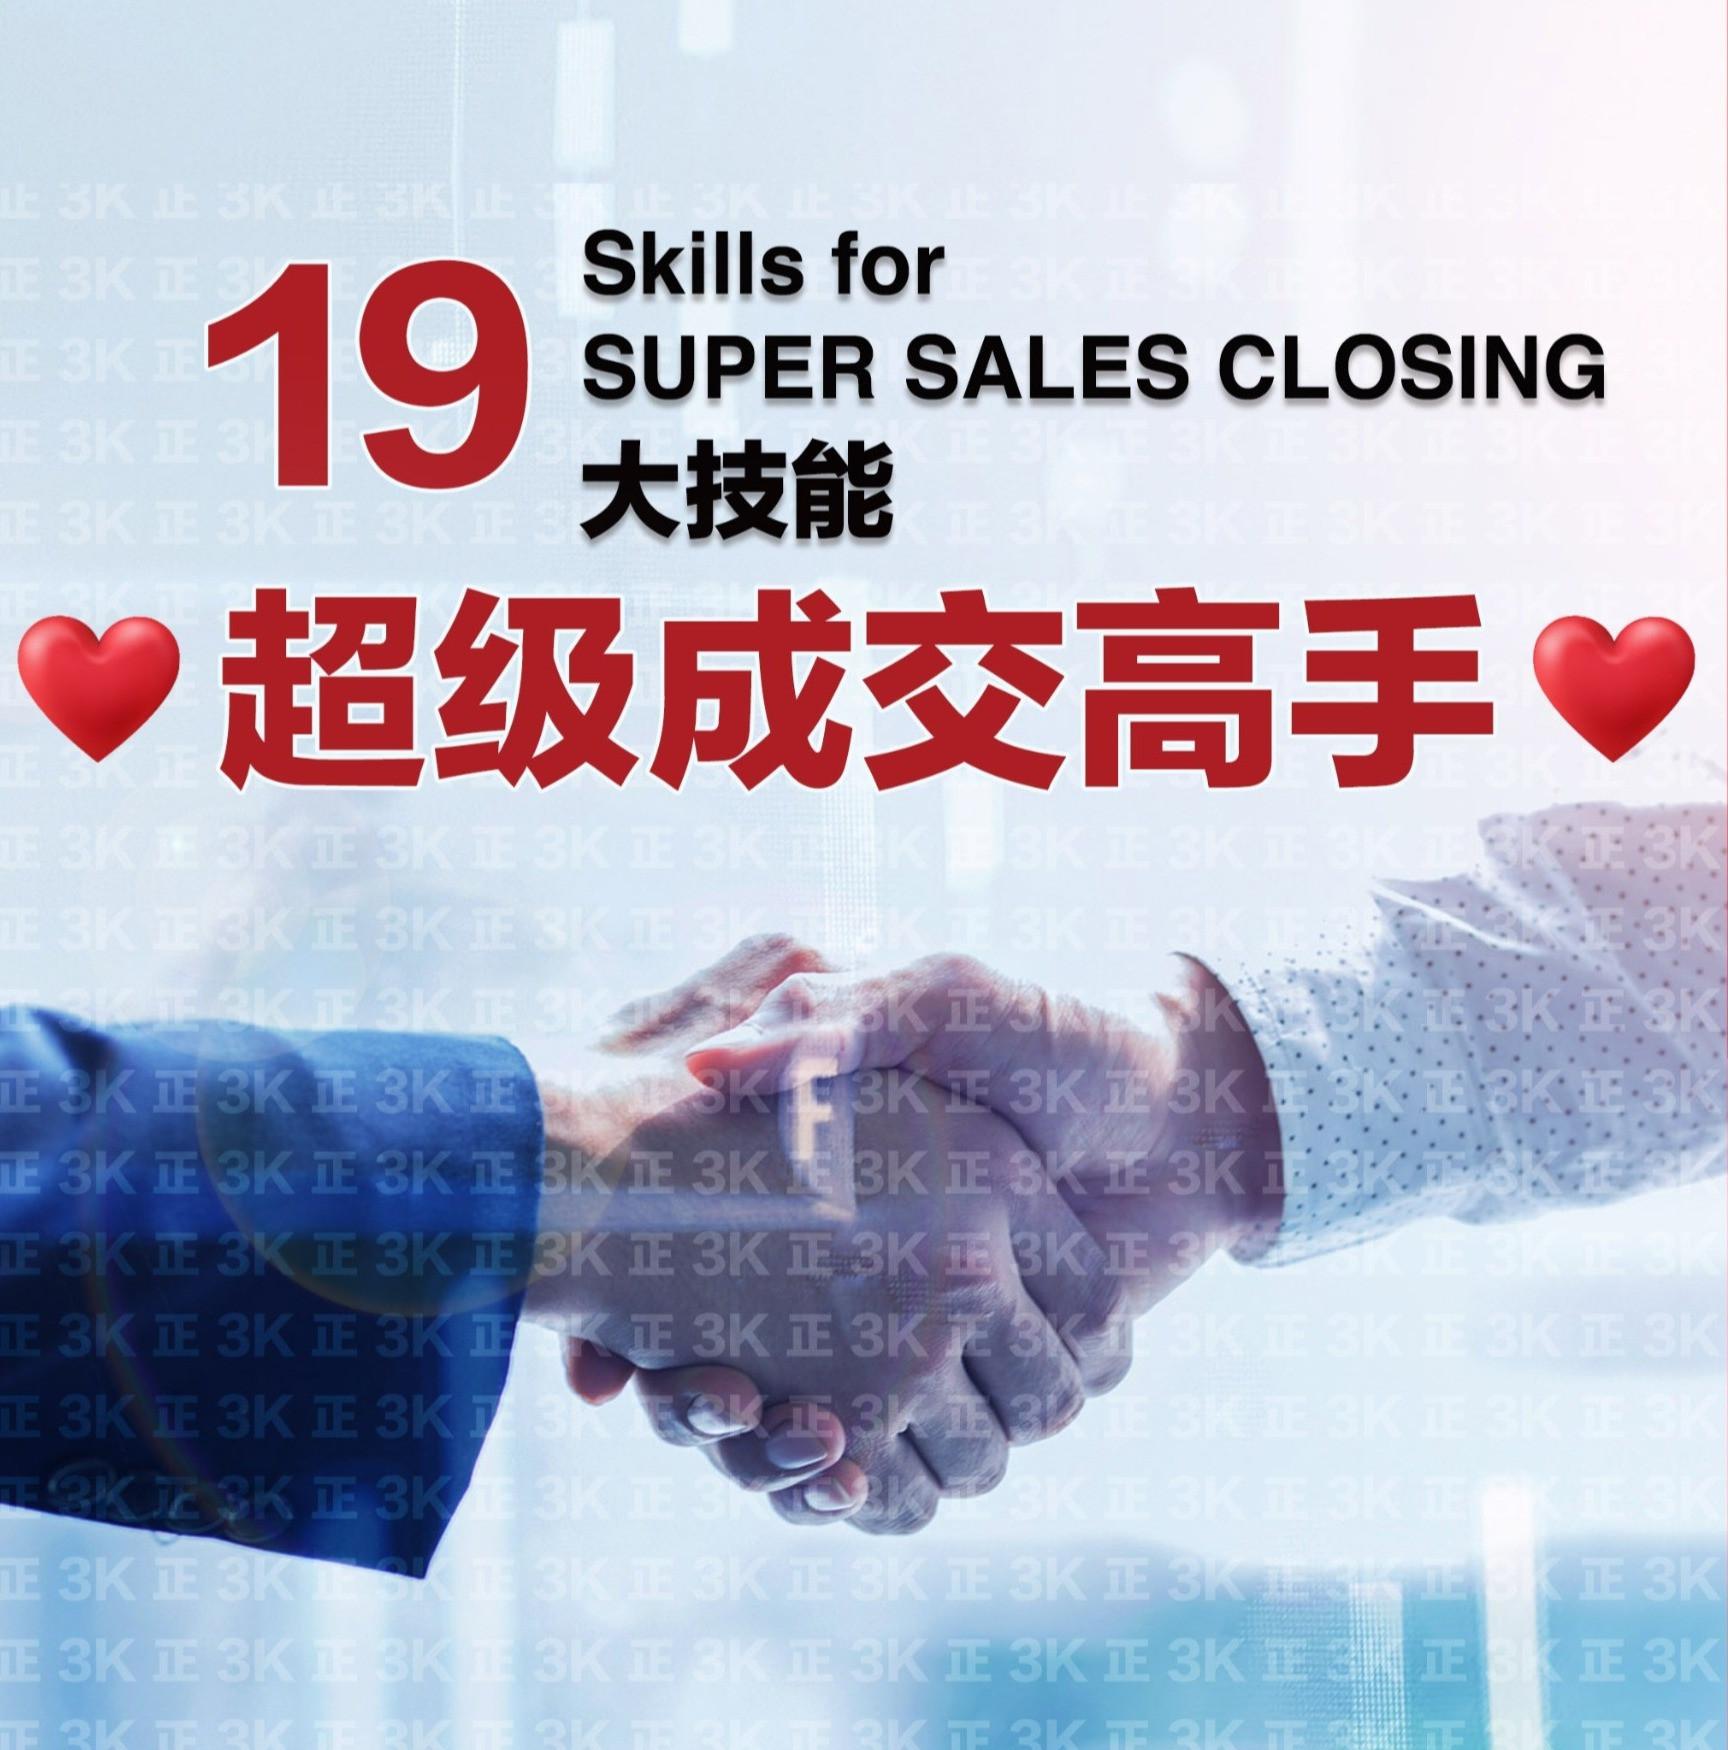 19 SKILLS FOR SUPER SALES CLOSING